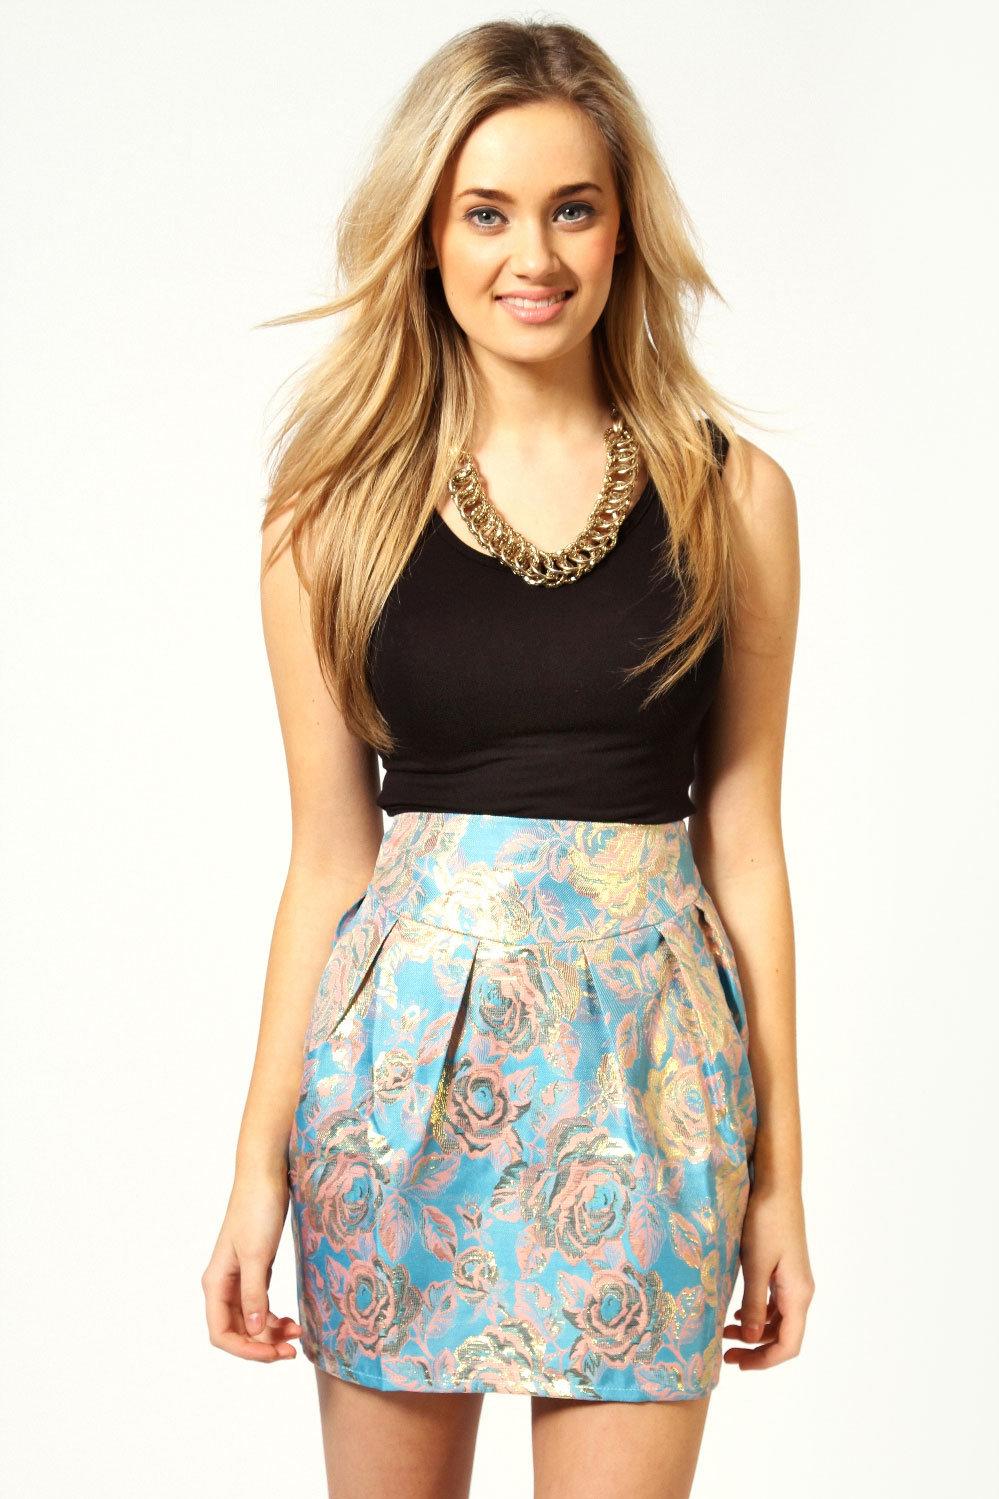 #boohoo                   #Skirt                    #Sofia #Brocade #Pastel #Colours #Lampshade #Skirt  Sofia Brocade Pastel Colours Lampshade Skirt                                  http://www.seapai.com/product.aspx?PID=426974